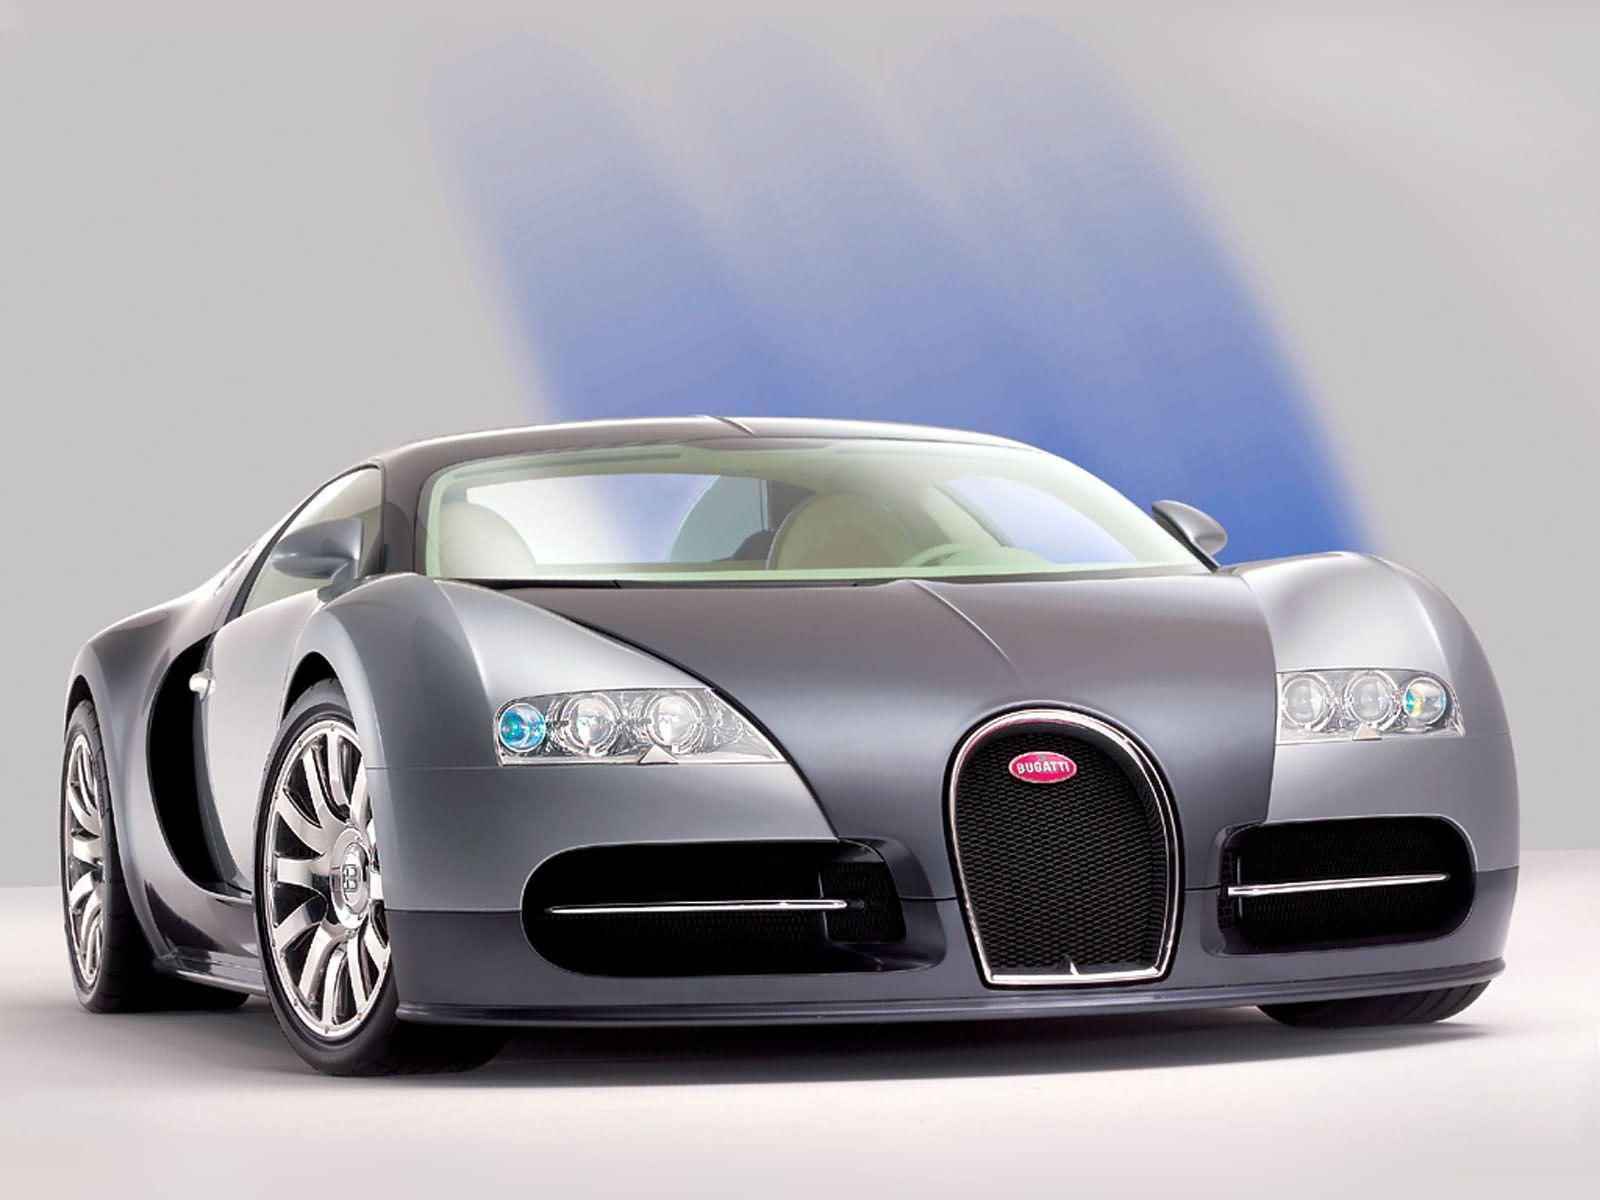 top wallpapers bugatti veyron wallpapers - Bugatti Veyron Wallpaper